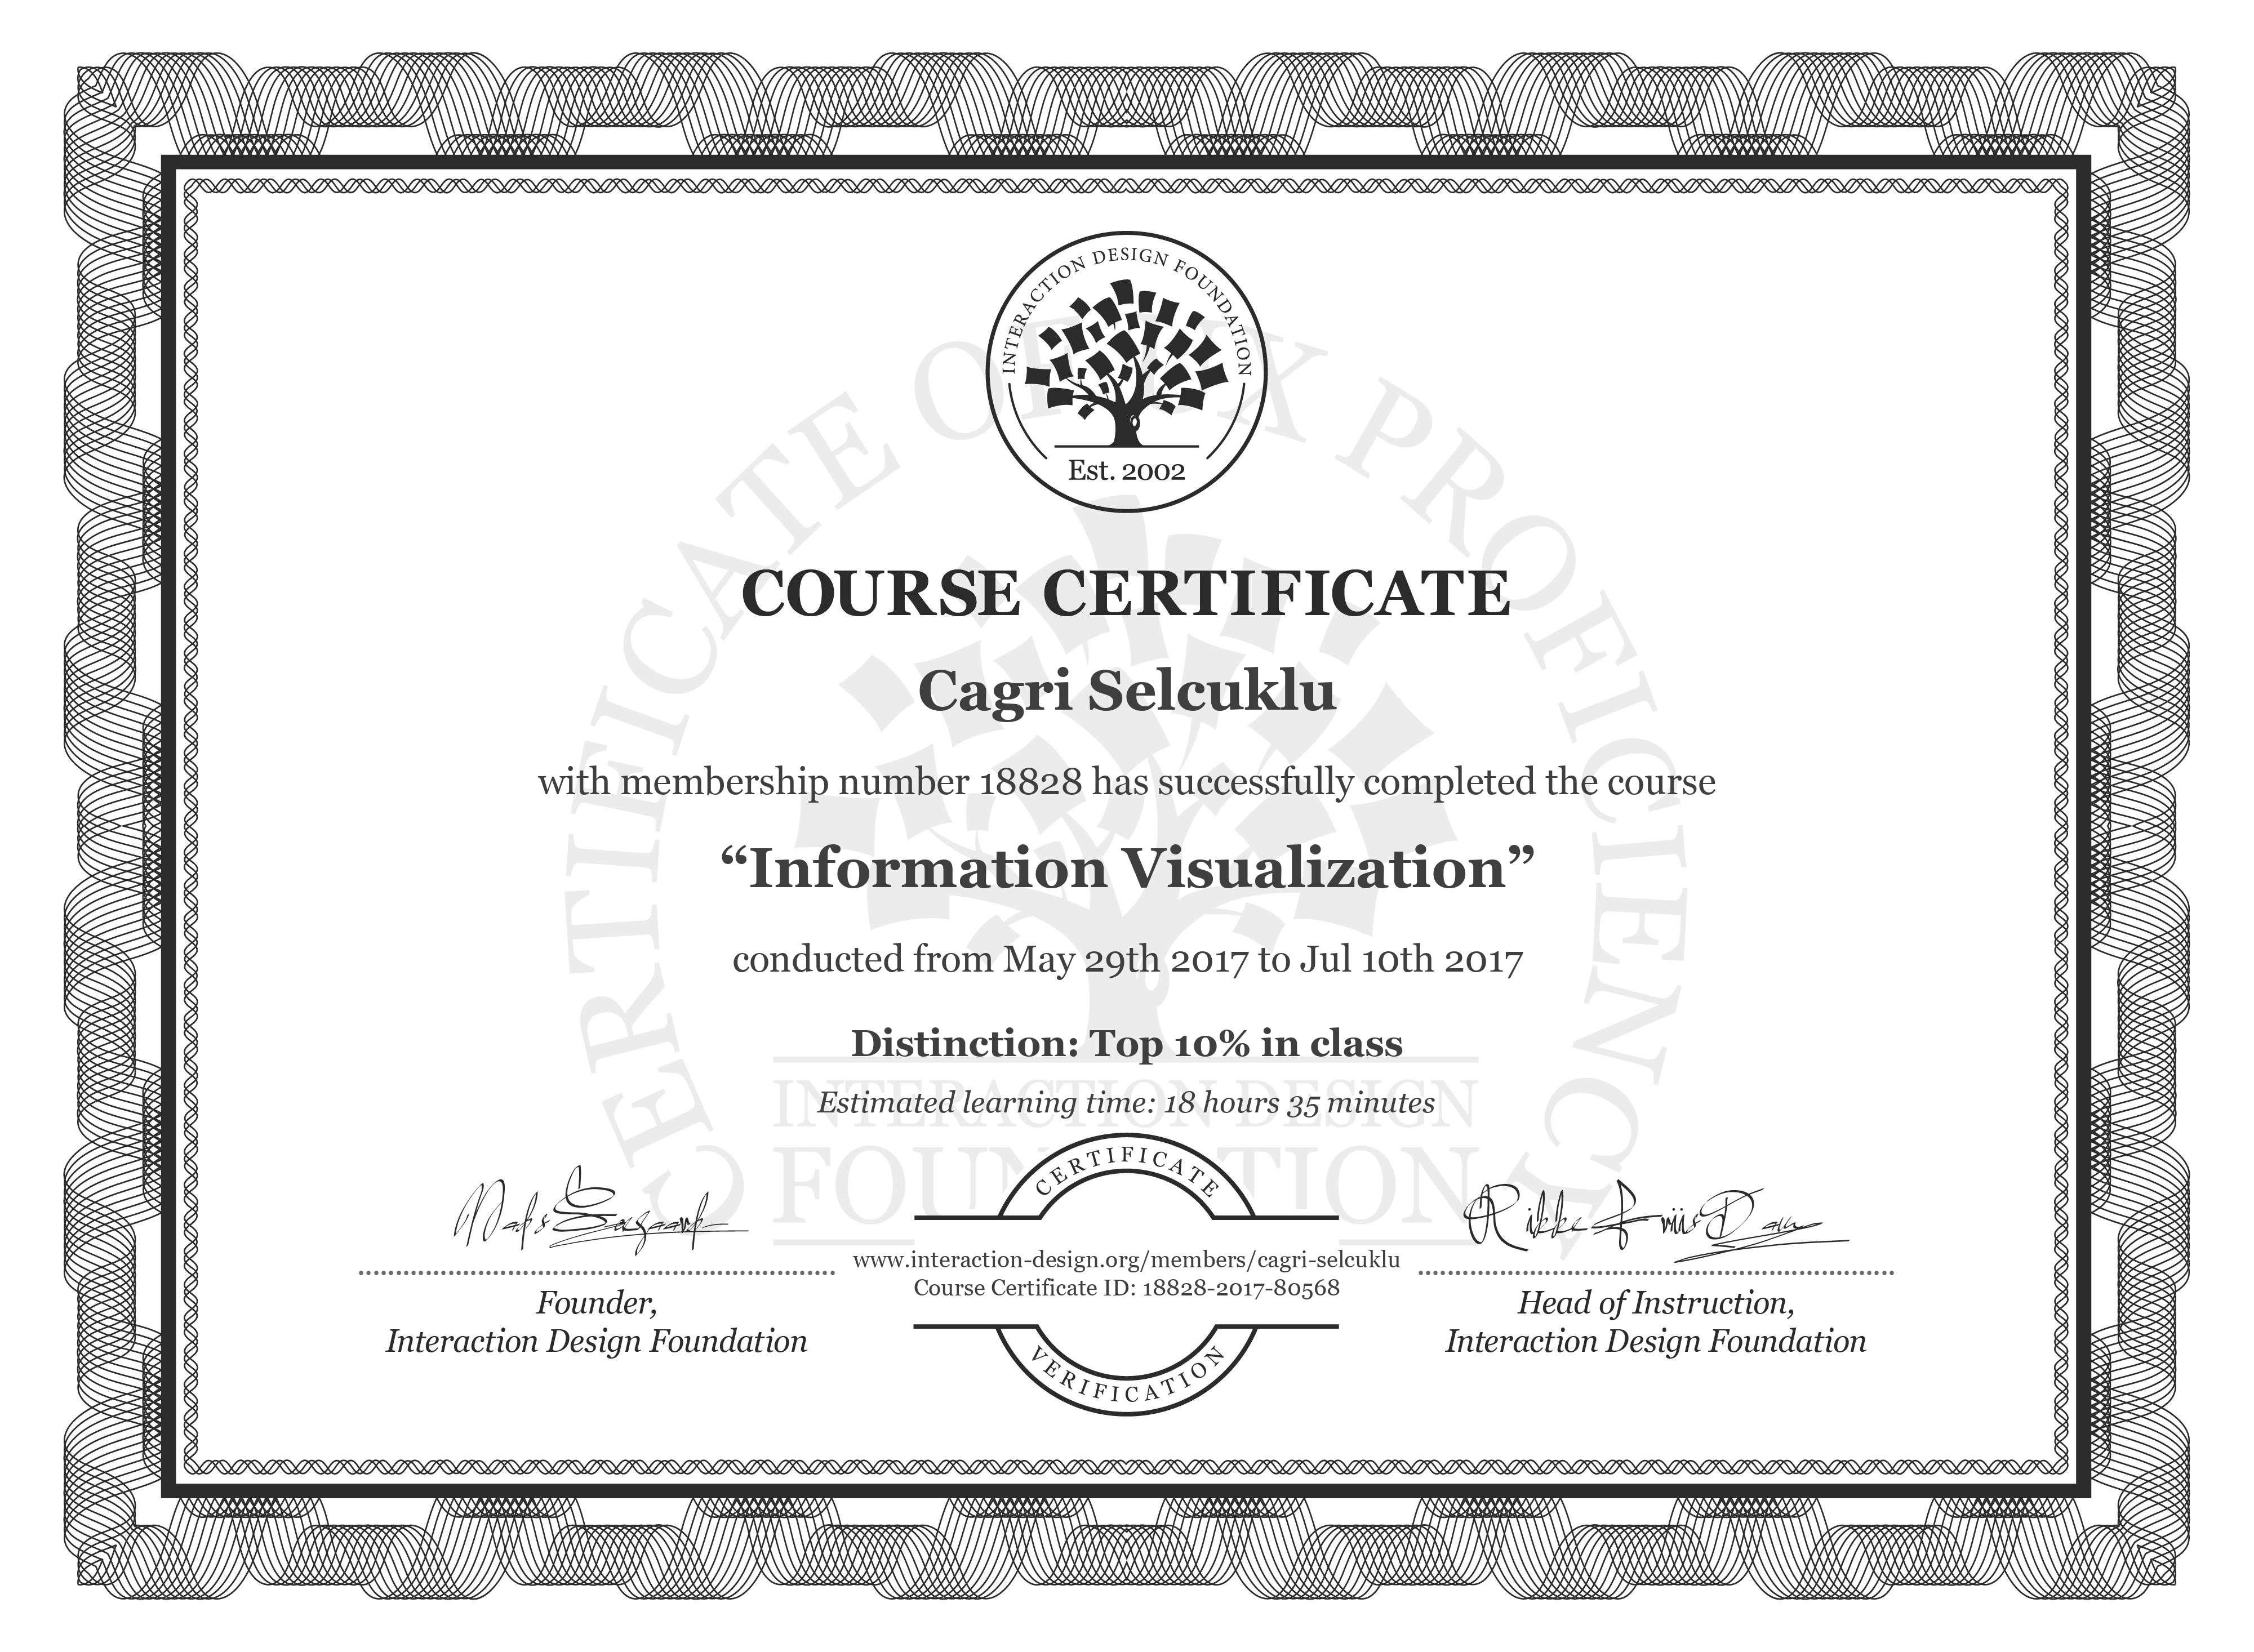 Cagri Selcuklu's Course Certificate: Information Visualization